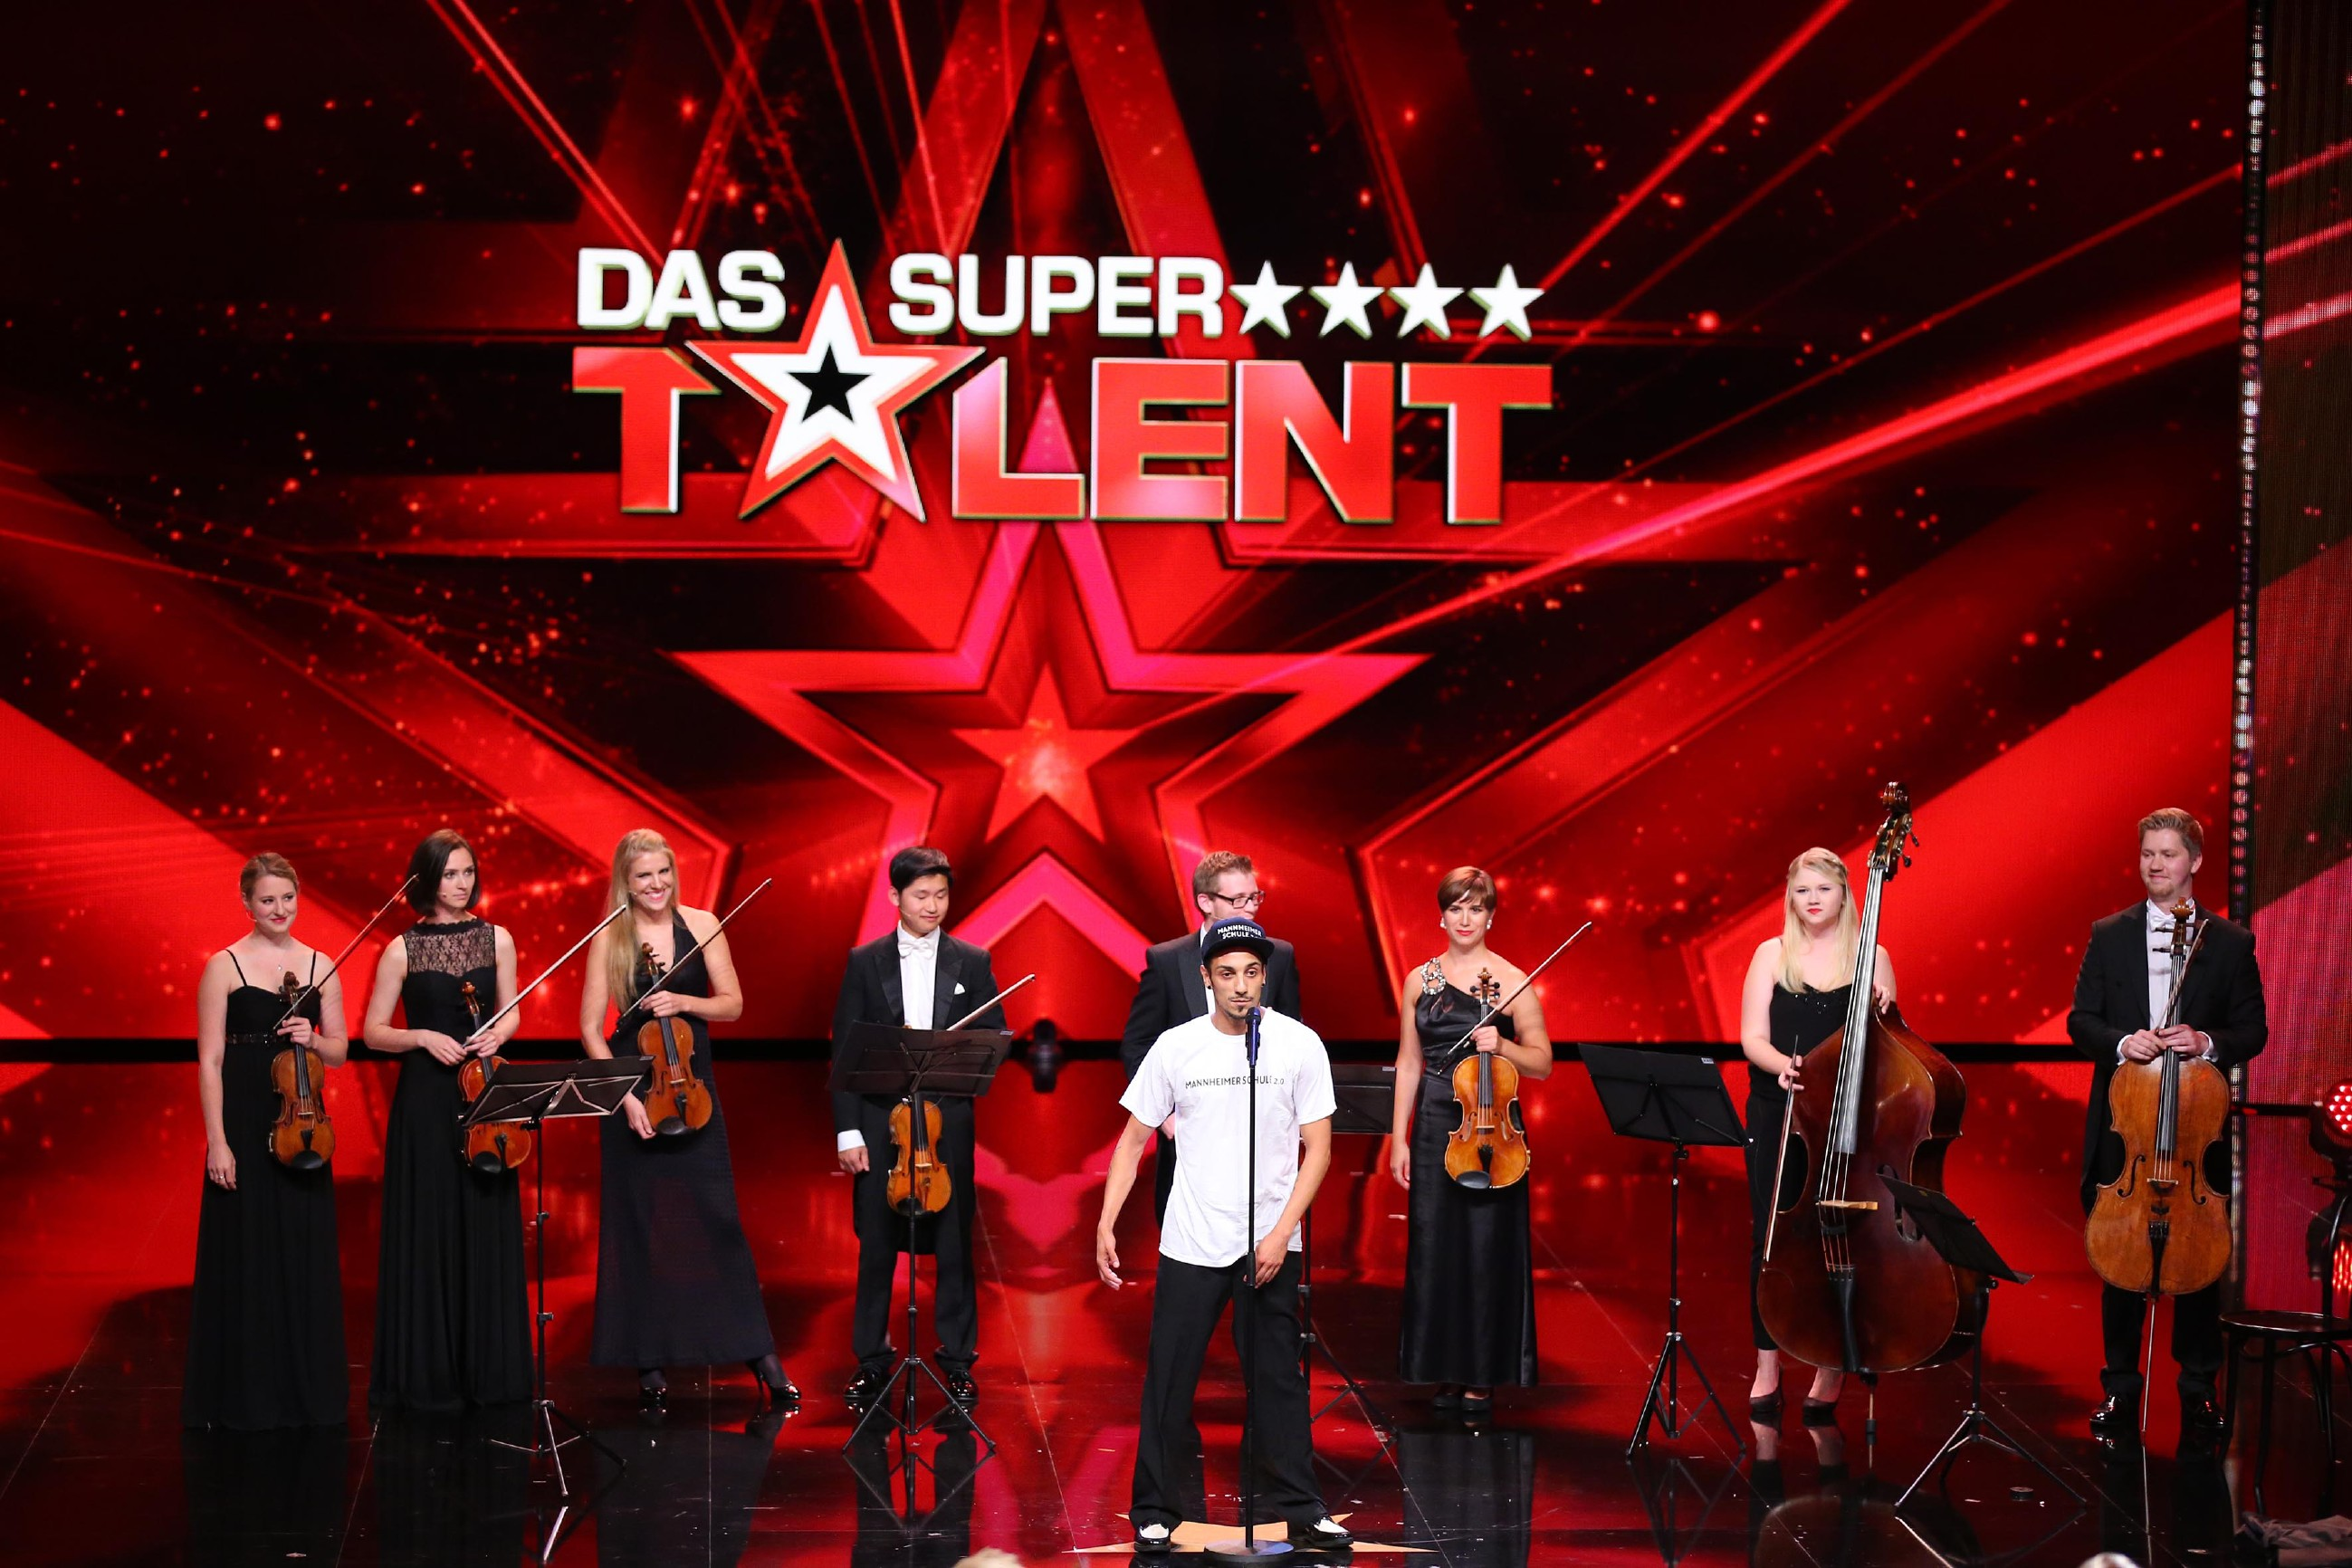 Das Supertalent 2016 - David Kwiek